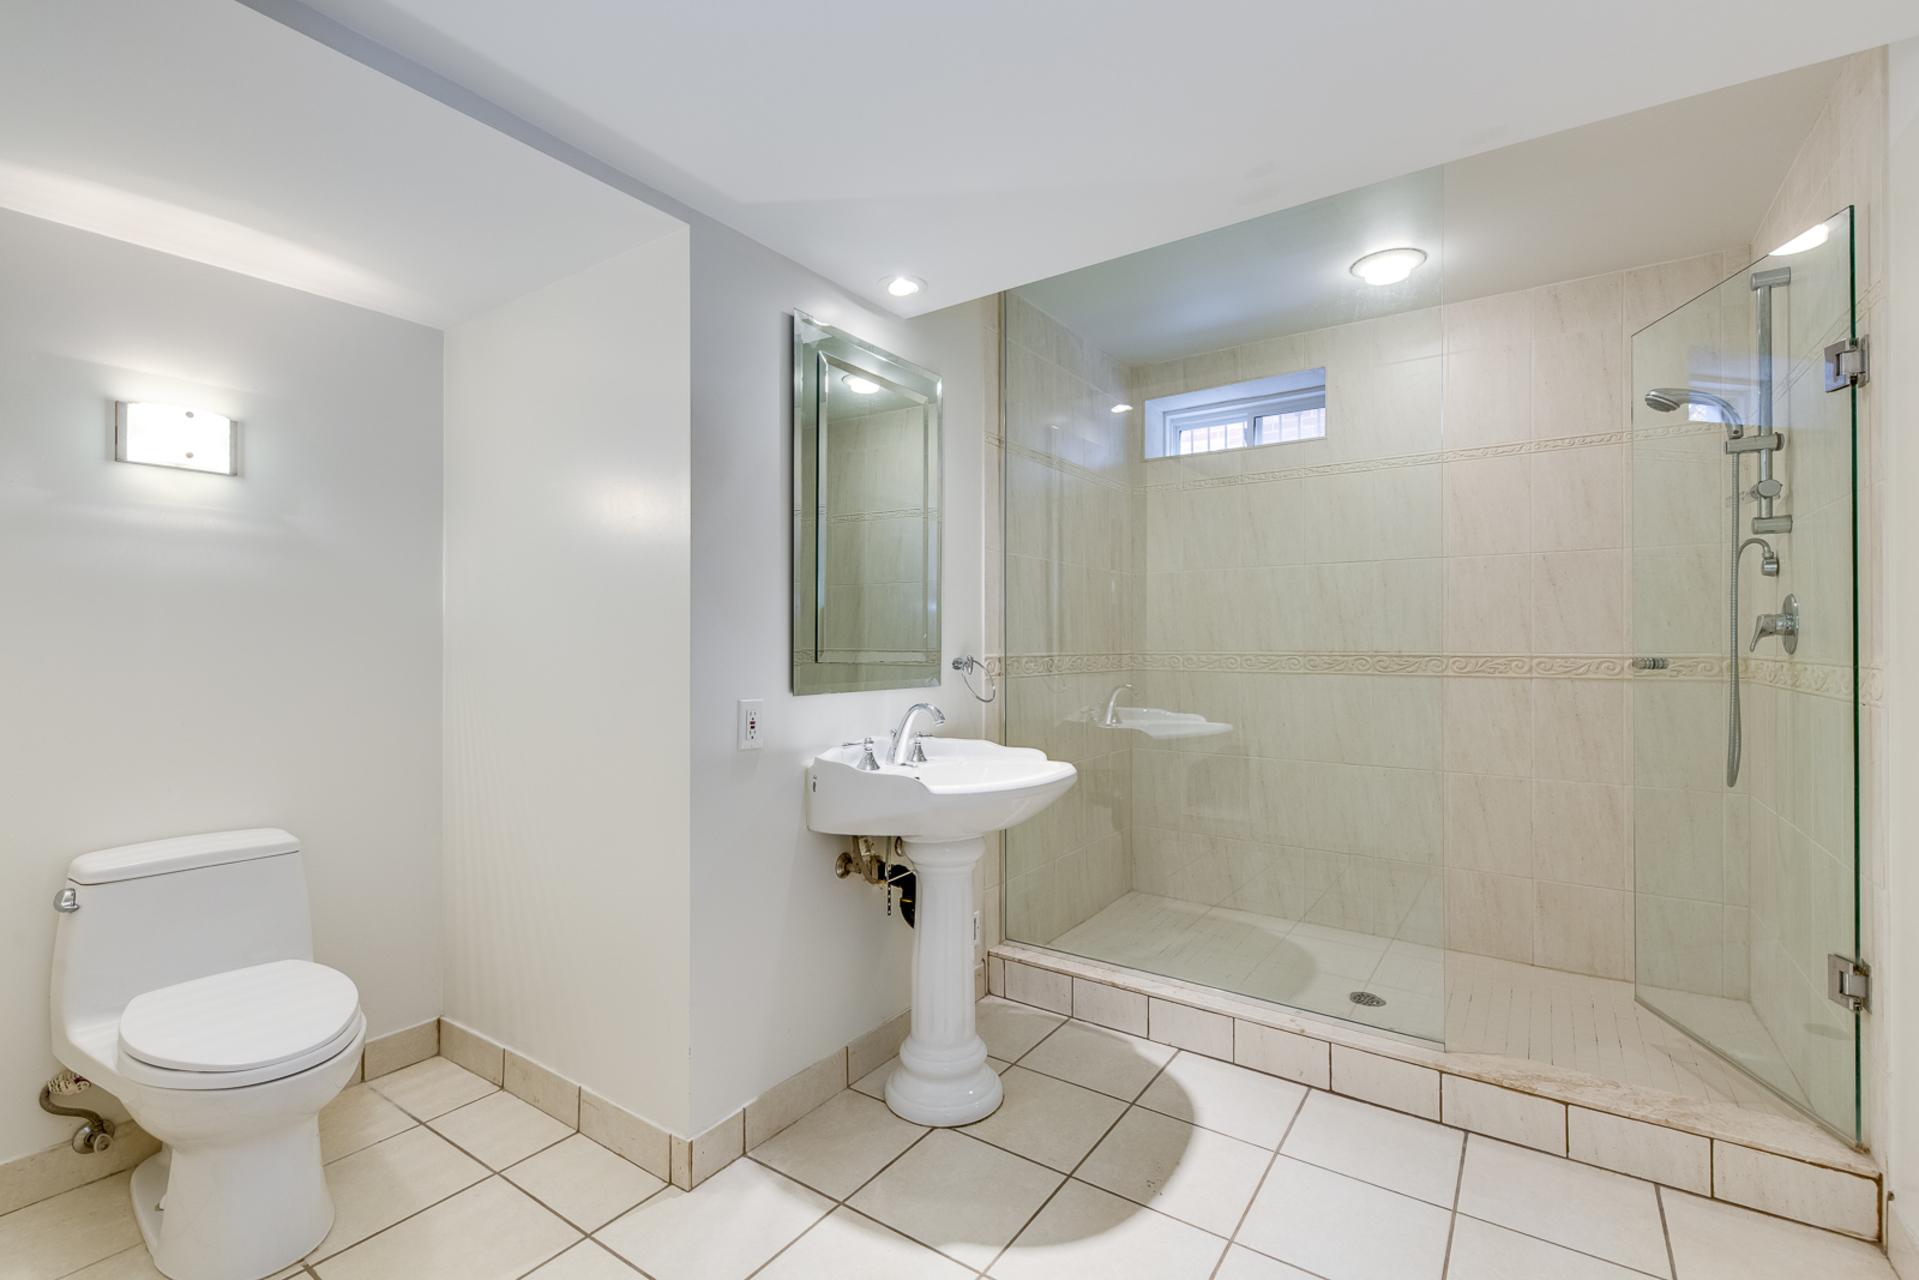 Basement Bathroom - 1806 Glenvista Dr, Oakville - Elite3 & Team at  Glenvista Drive, Iroquois Ridge North, Oakville